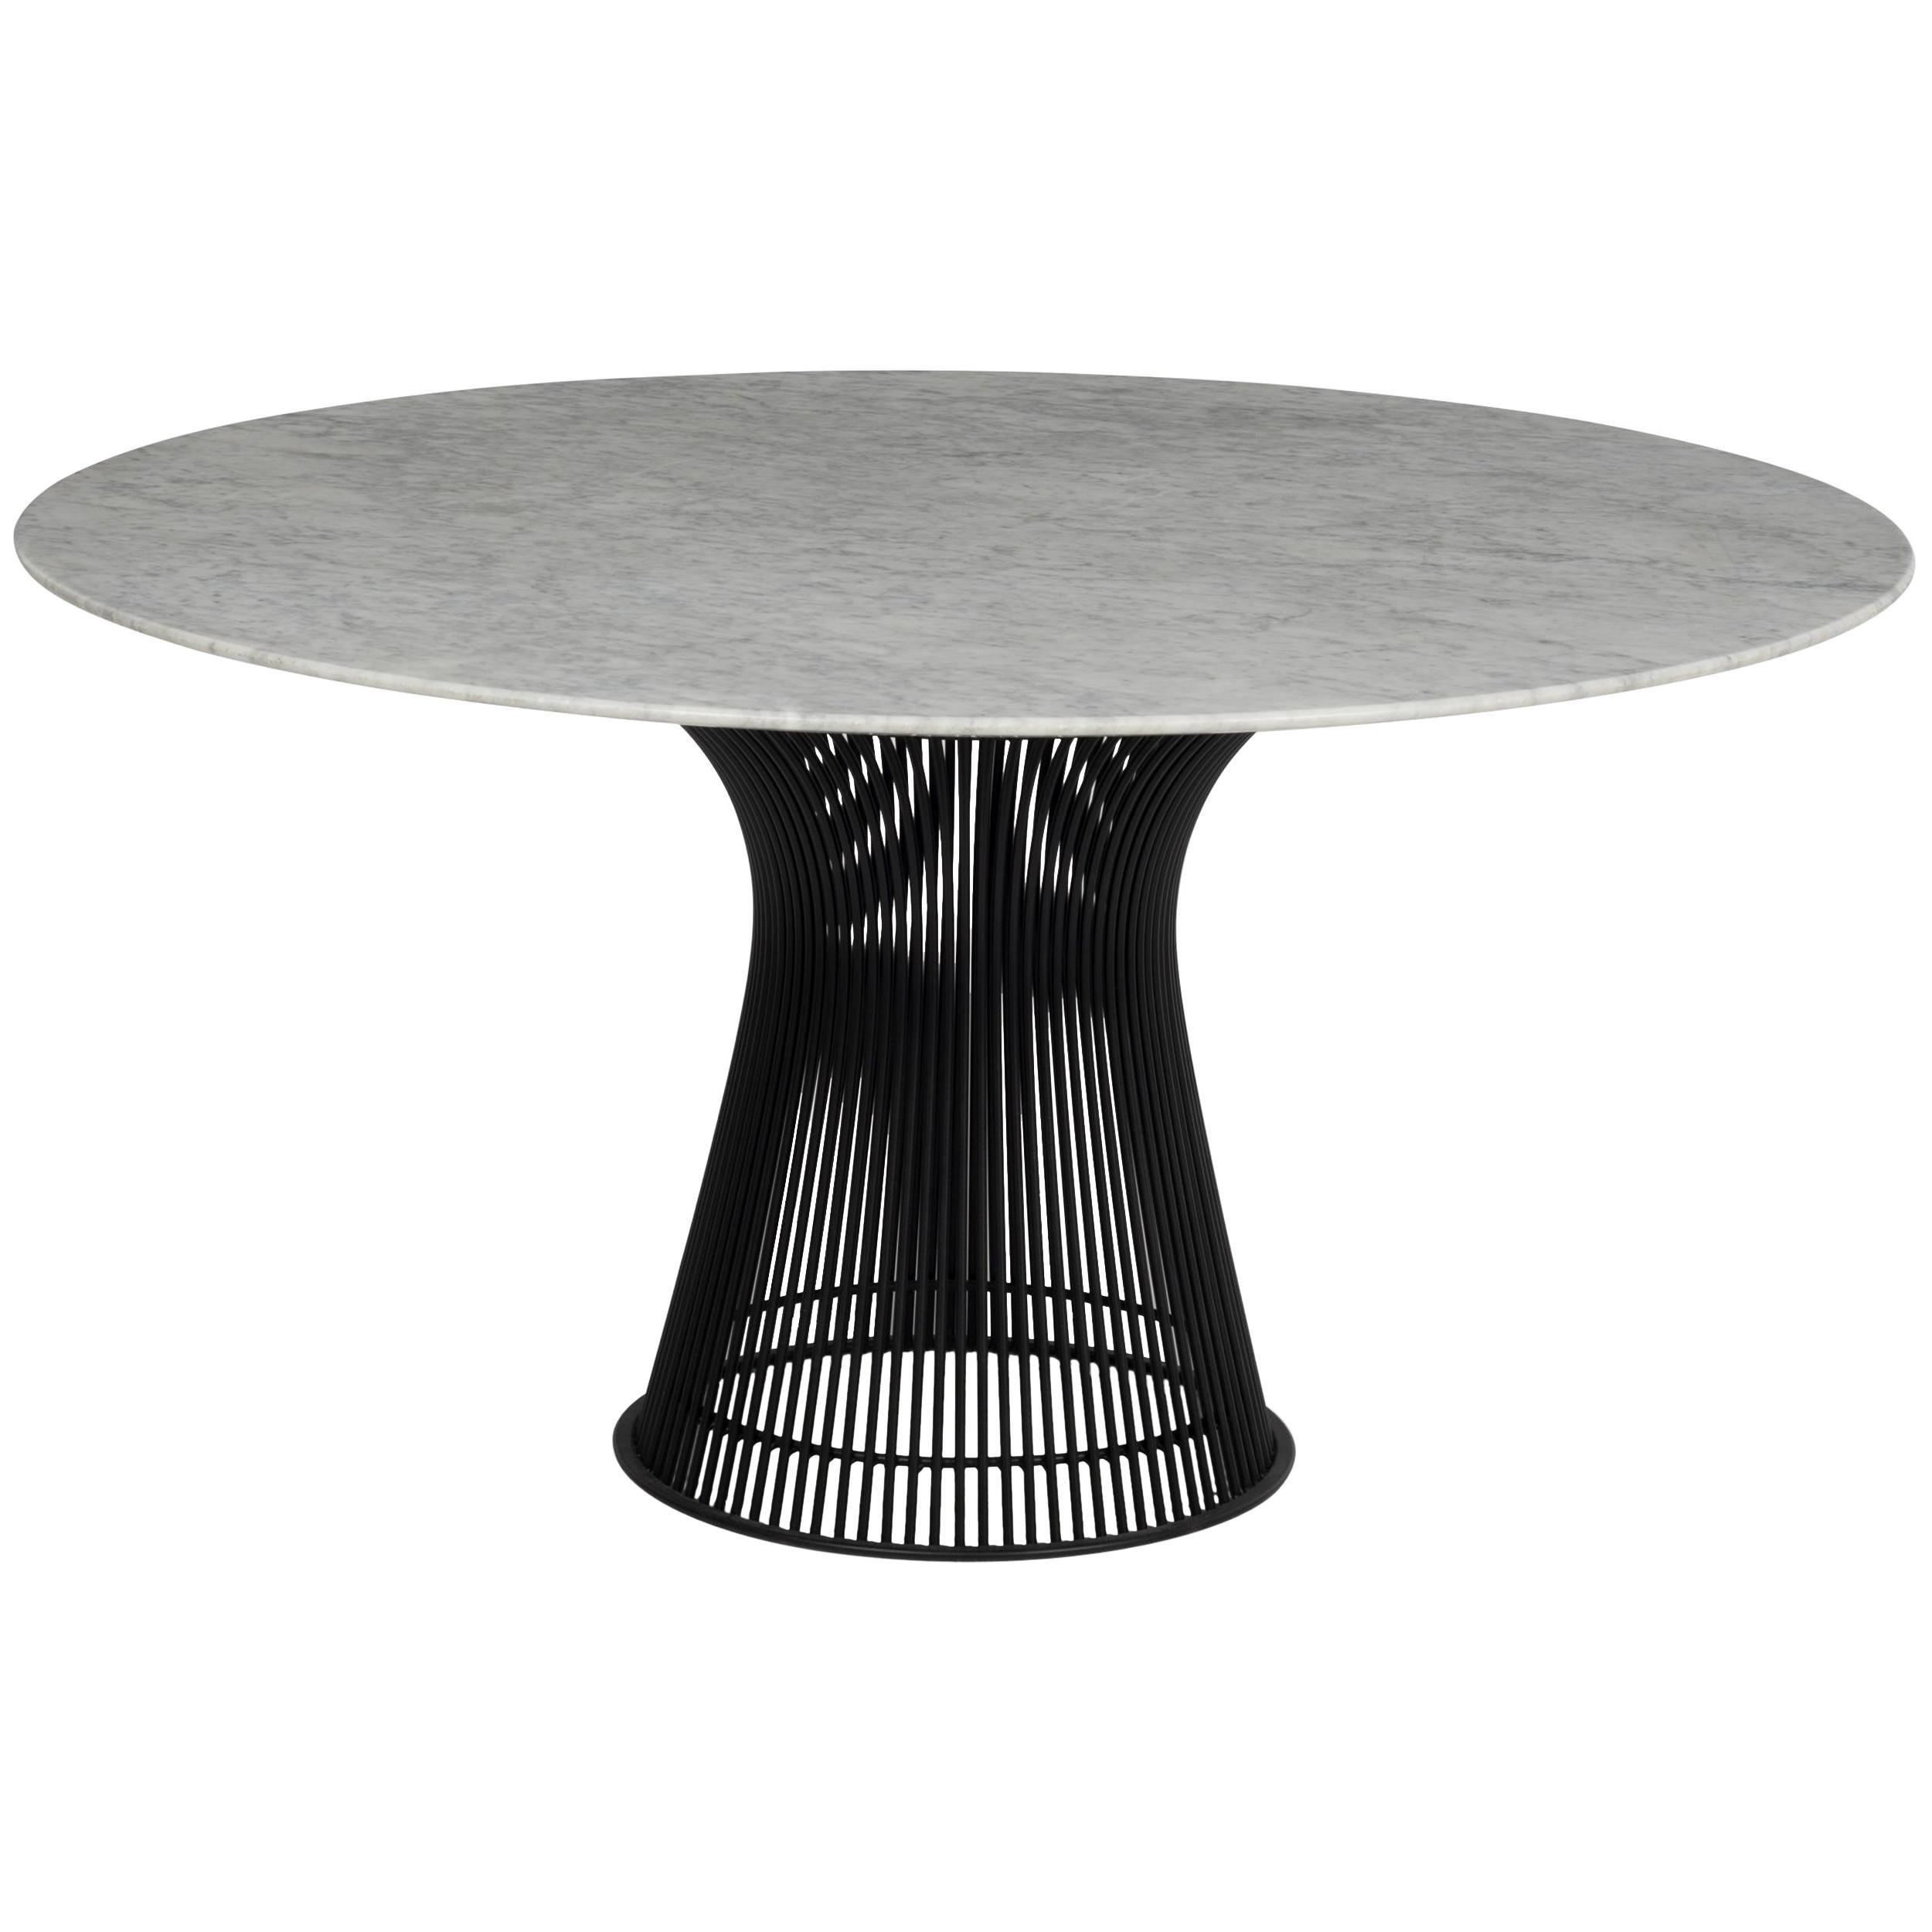 Warren Platner Dining Table, Custom blackened Base Carrera Italian Marble Top